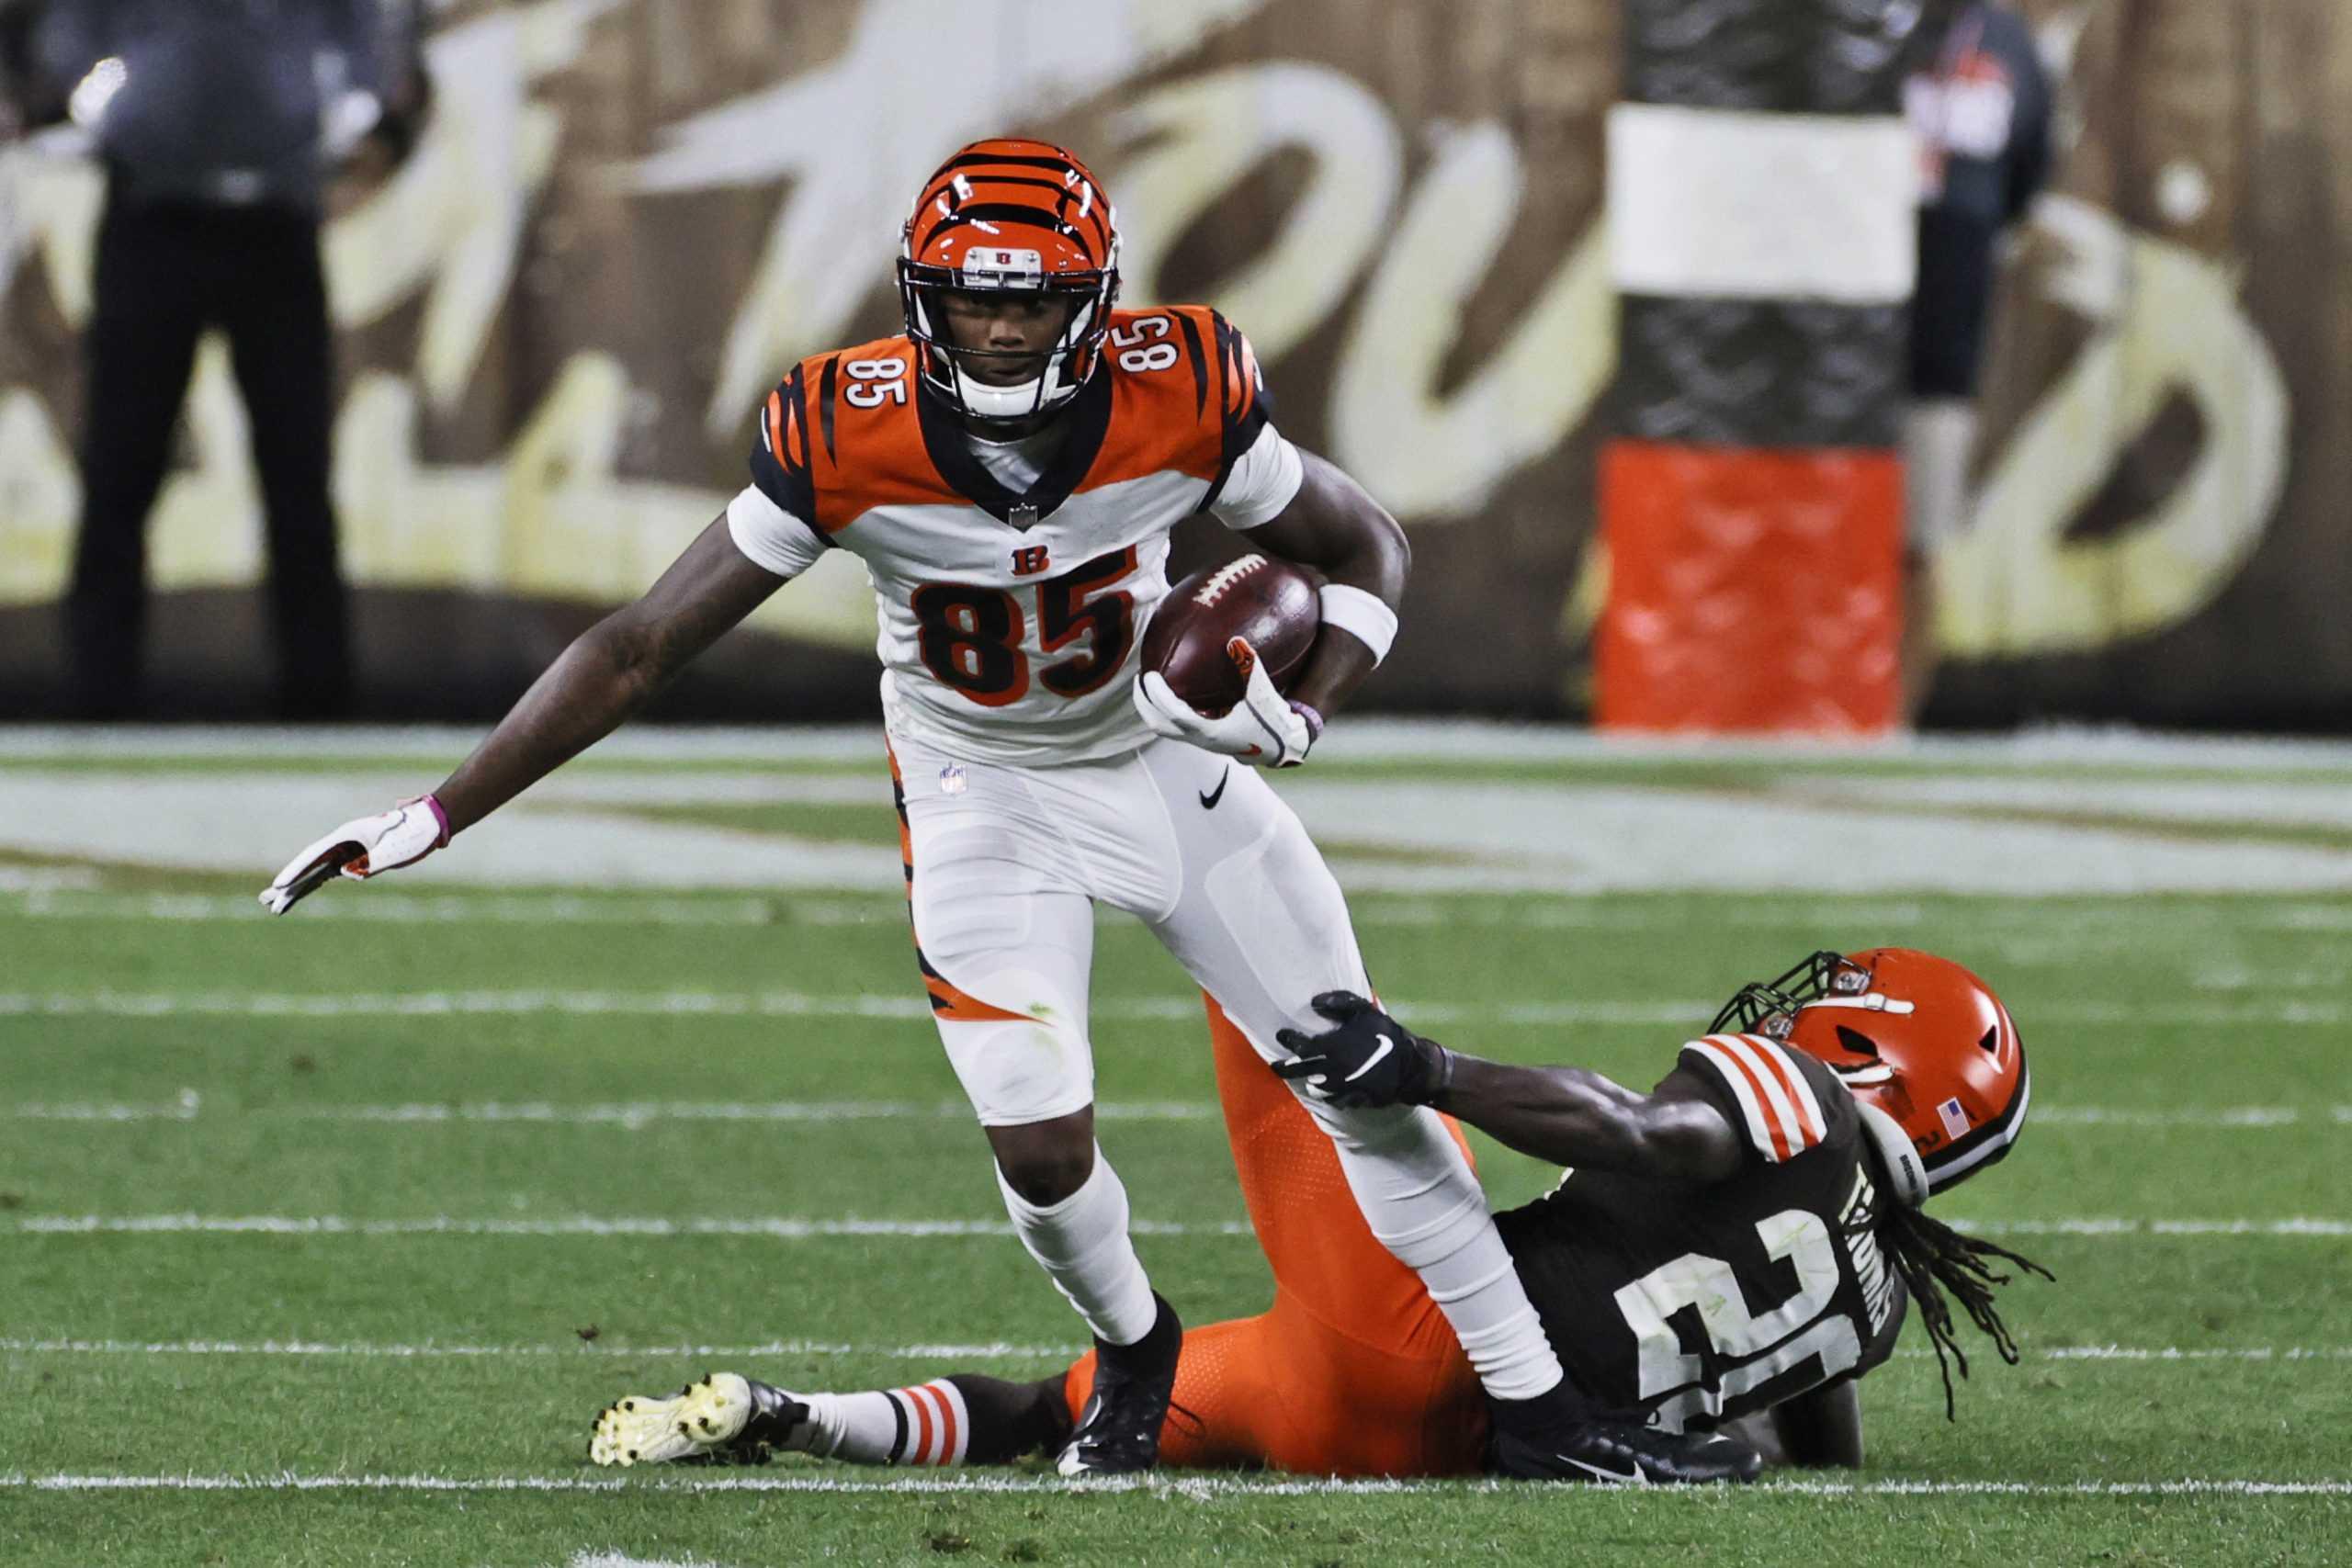 Top 10 NFL Rookie Wide Receivers